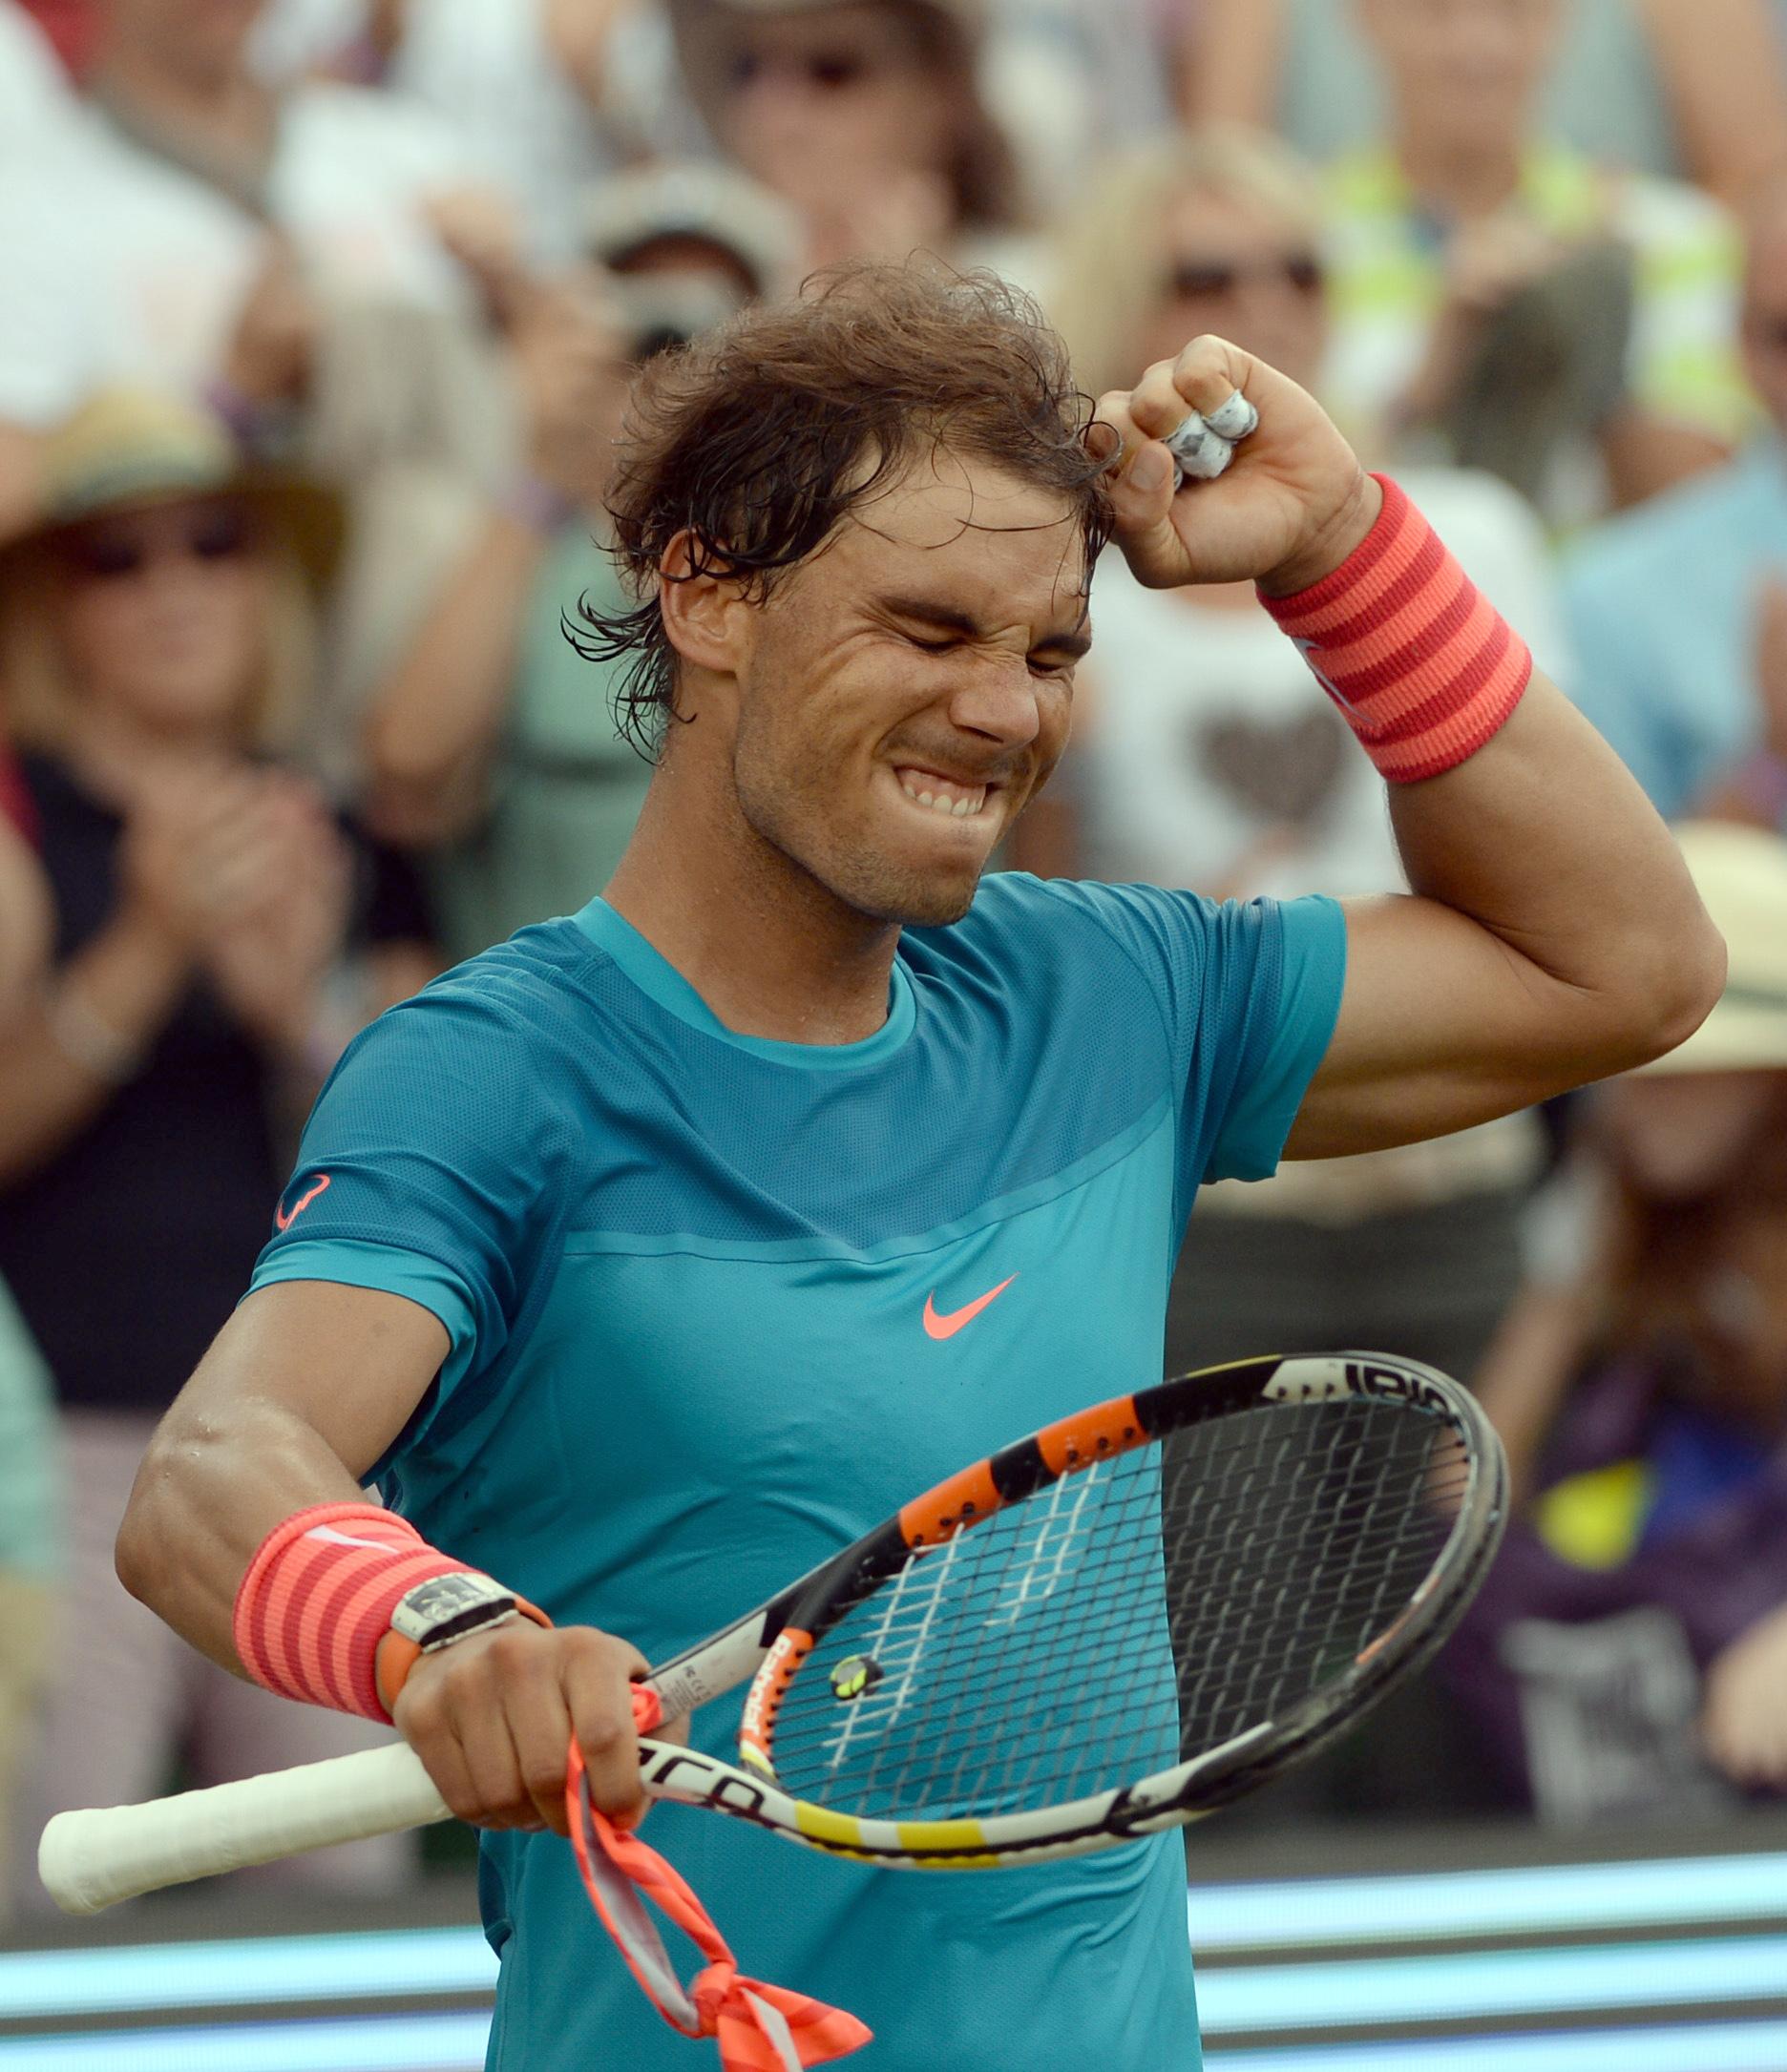 Spain's Rafael Nadal  celebrates  after he won the semifinal tennis match against Gael Monfils from France, at the ATP Mercedes Cup tennis tournament in Stuttgart, Germany, Saturday June 13, 2015. ( Marijan Murat/dpa, via AP)